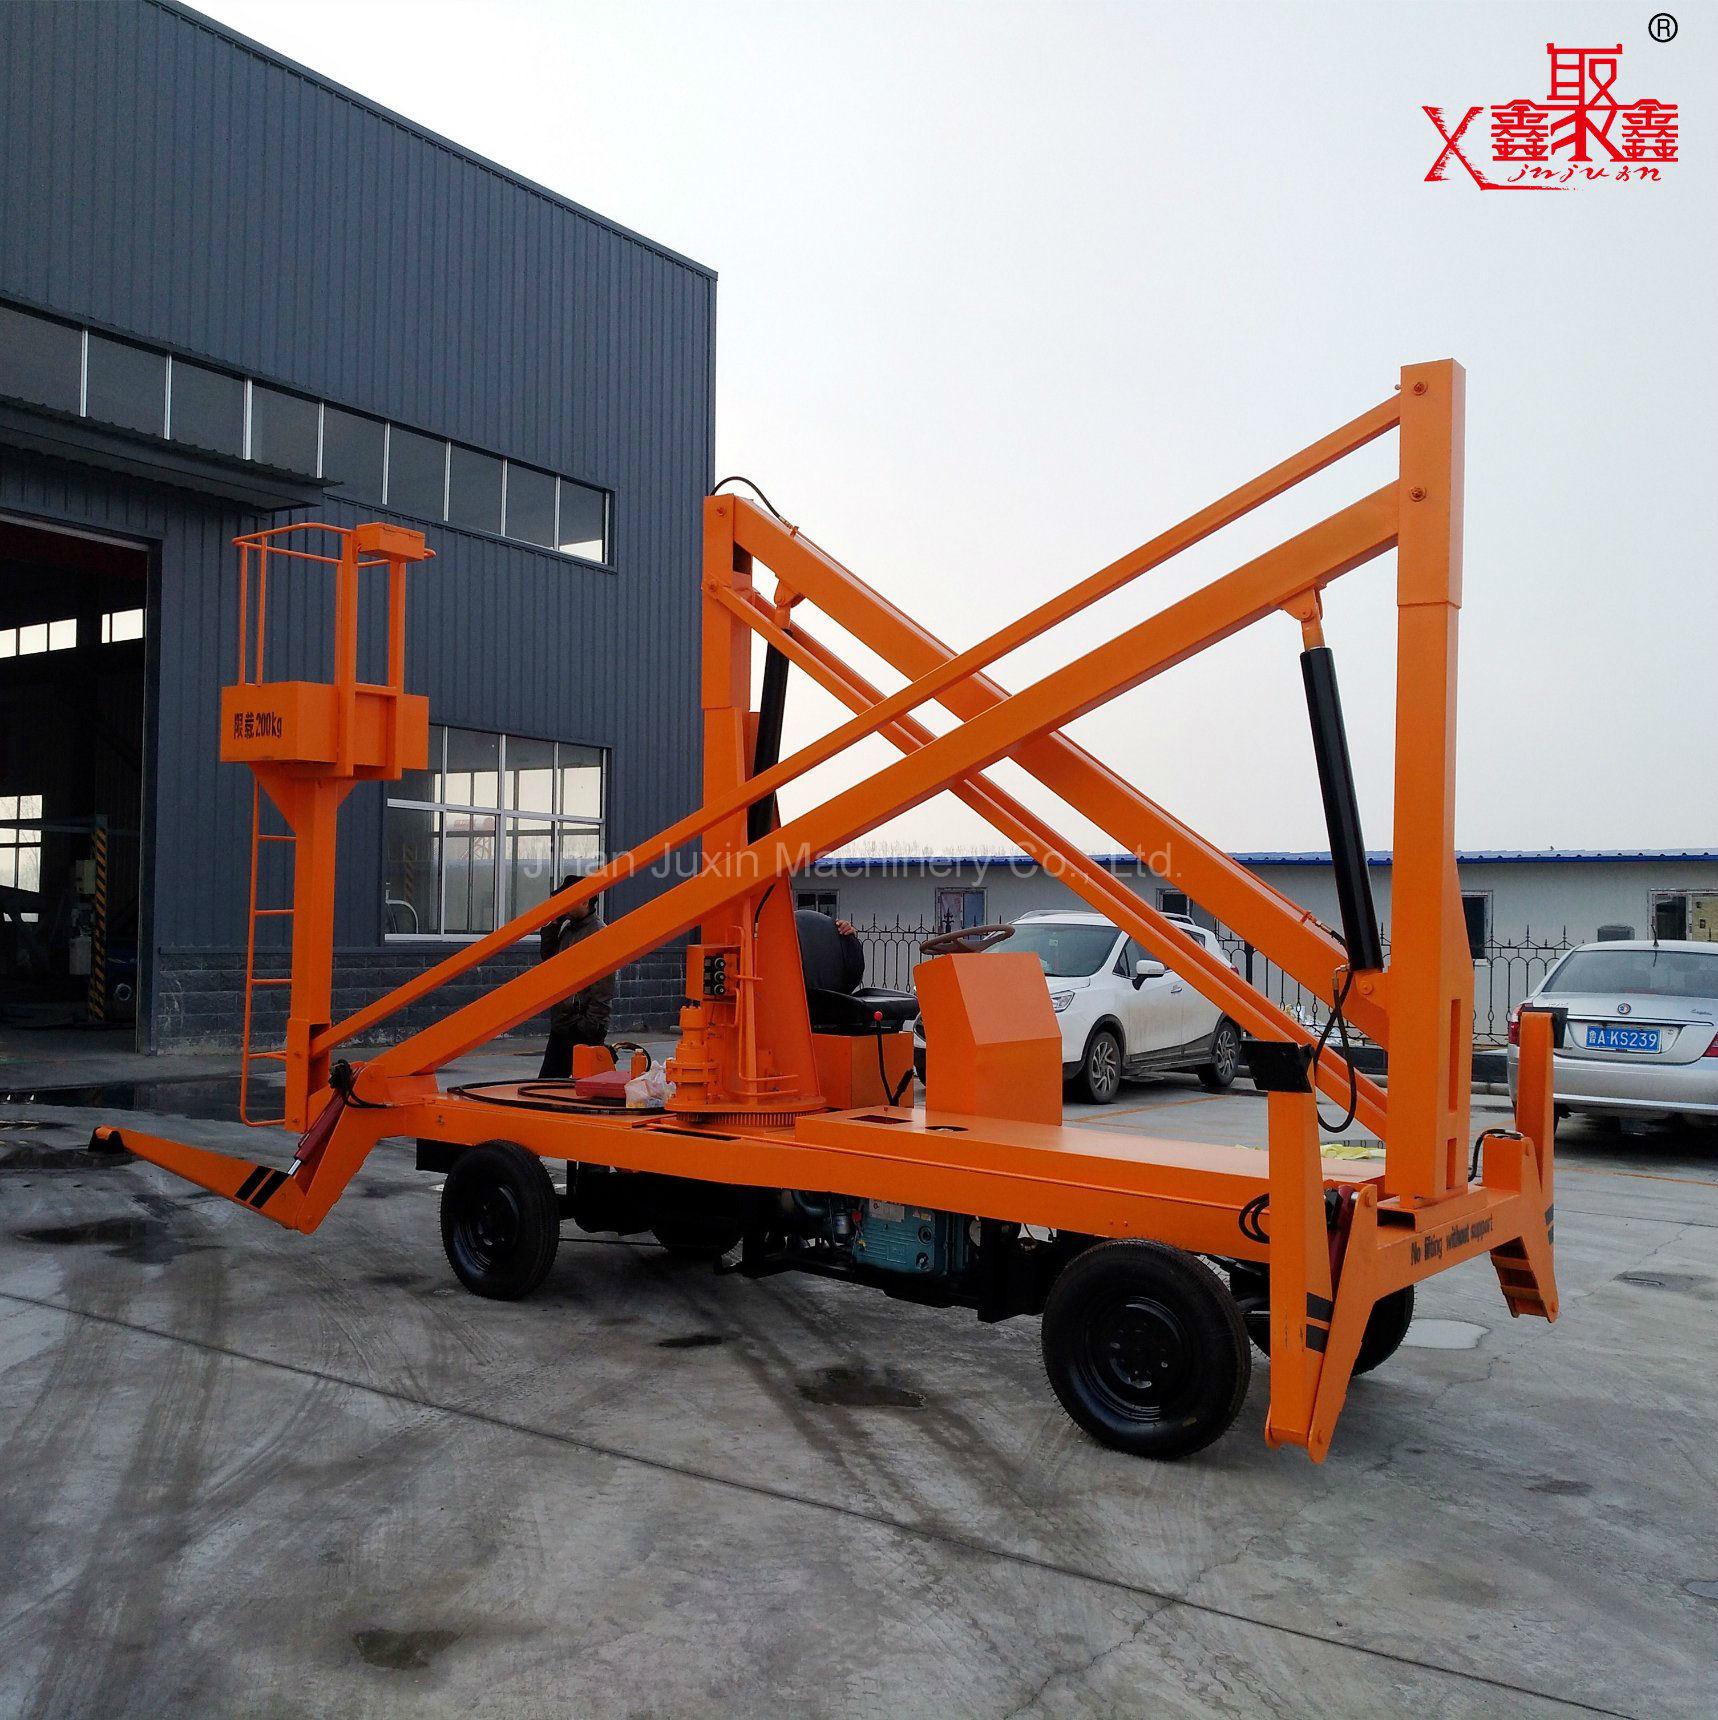 Aerial Repair Trailer Movable Folding Arm Boom Lifting Platform